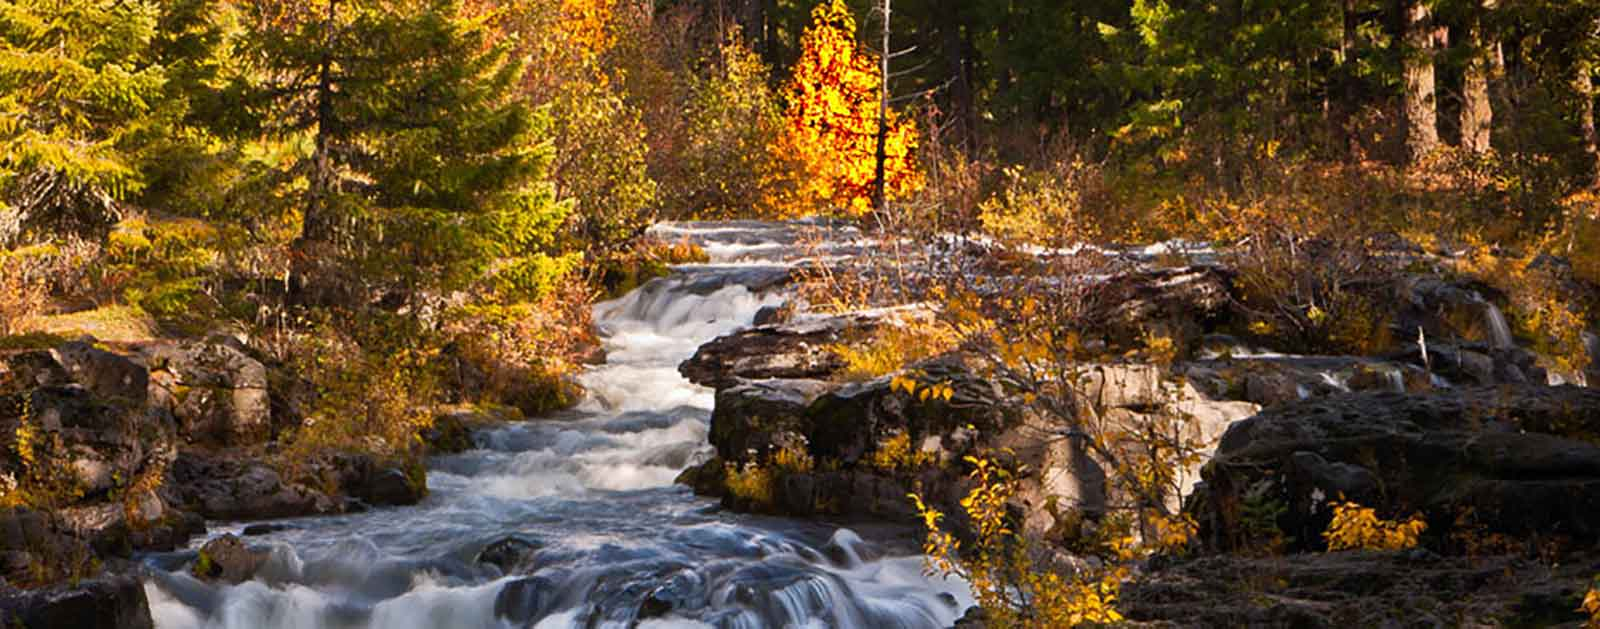 Birch Tree Fall Wallpaper Enjoying Fall Foliage By The River American Rivers